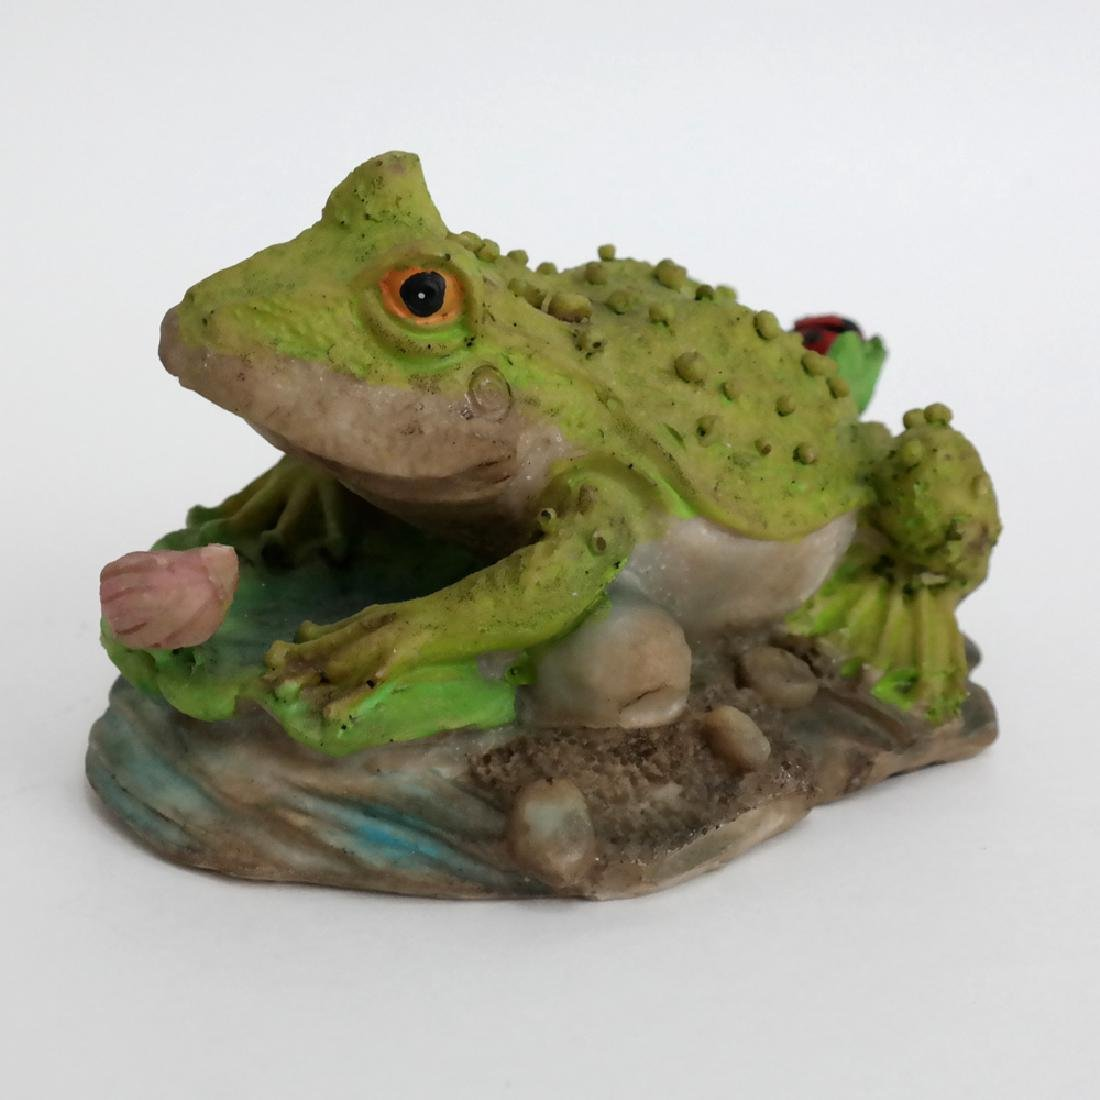 Vintage FROG TOAD WITH LADYBUG statue figurine